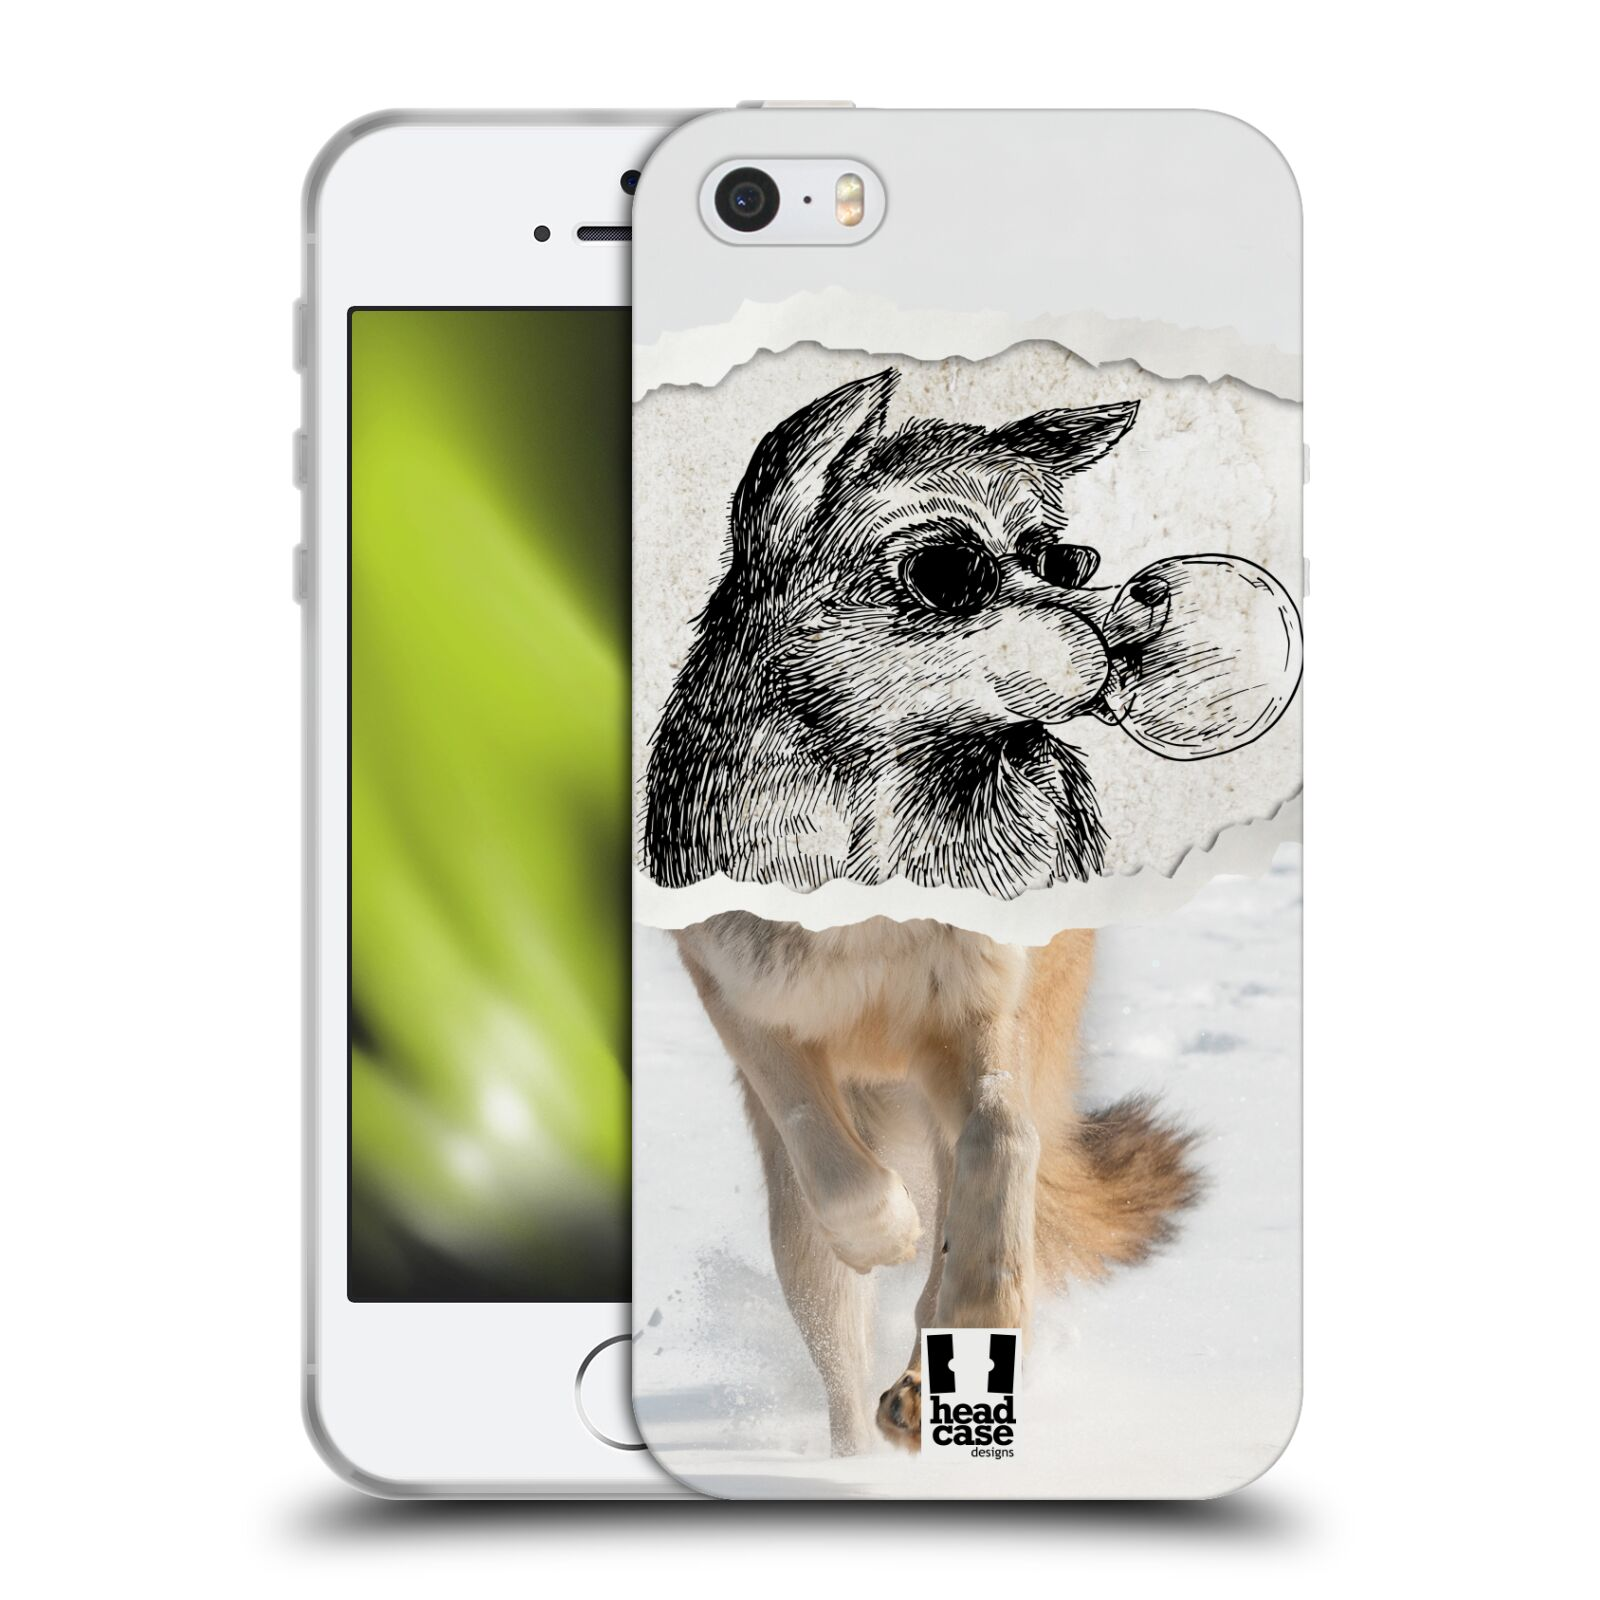 HEAD CASE silikonový obal na mobil Apple Iphone SE vzor zvířata koláž vlk  pohodář 6854e014bc4